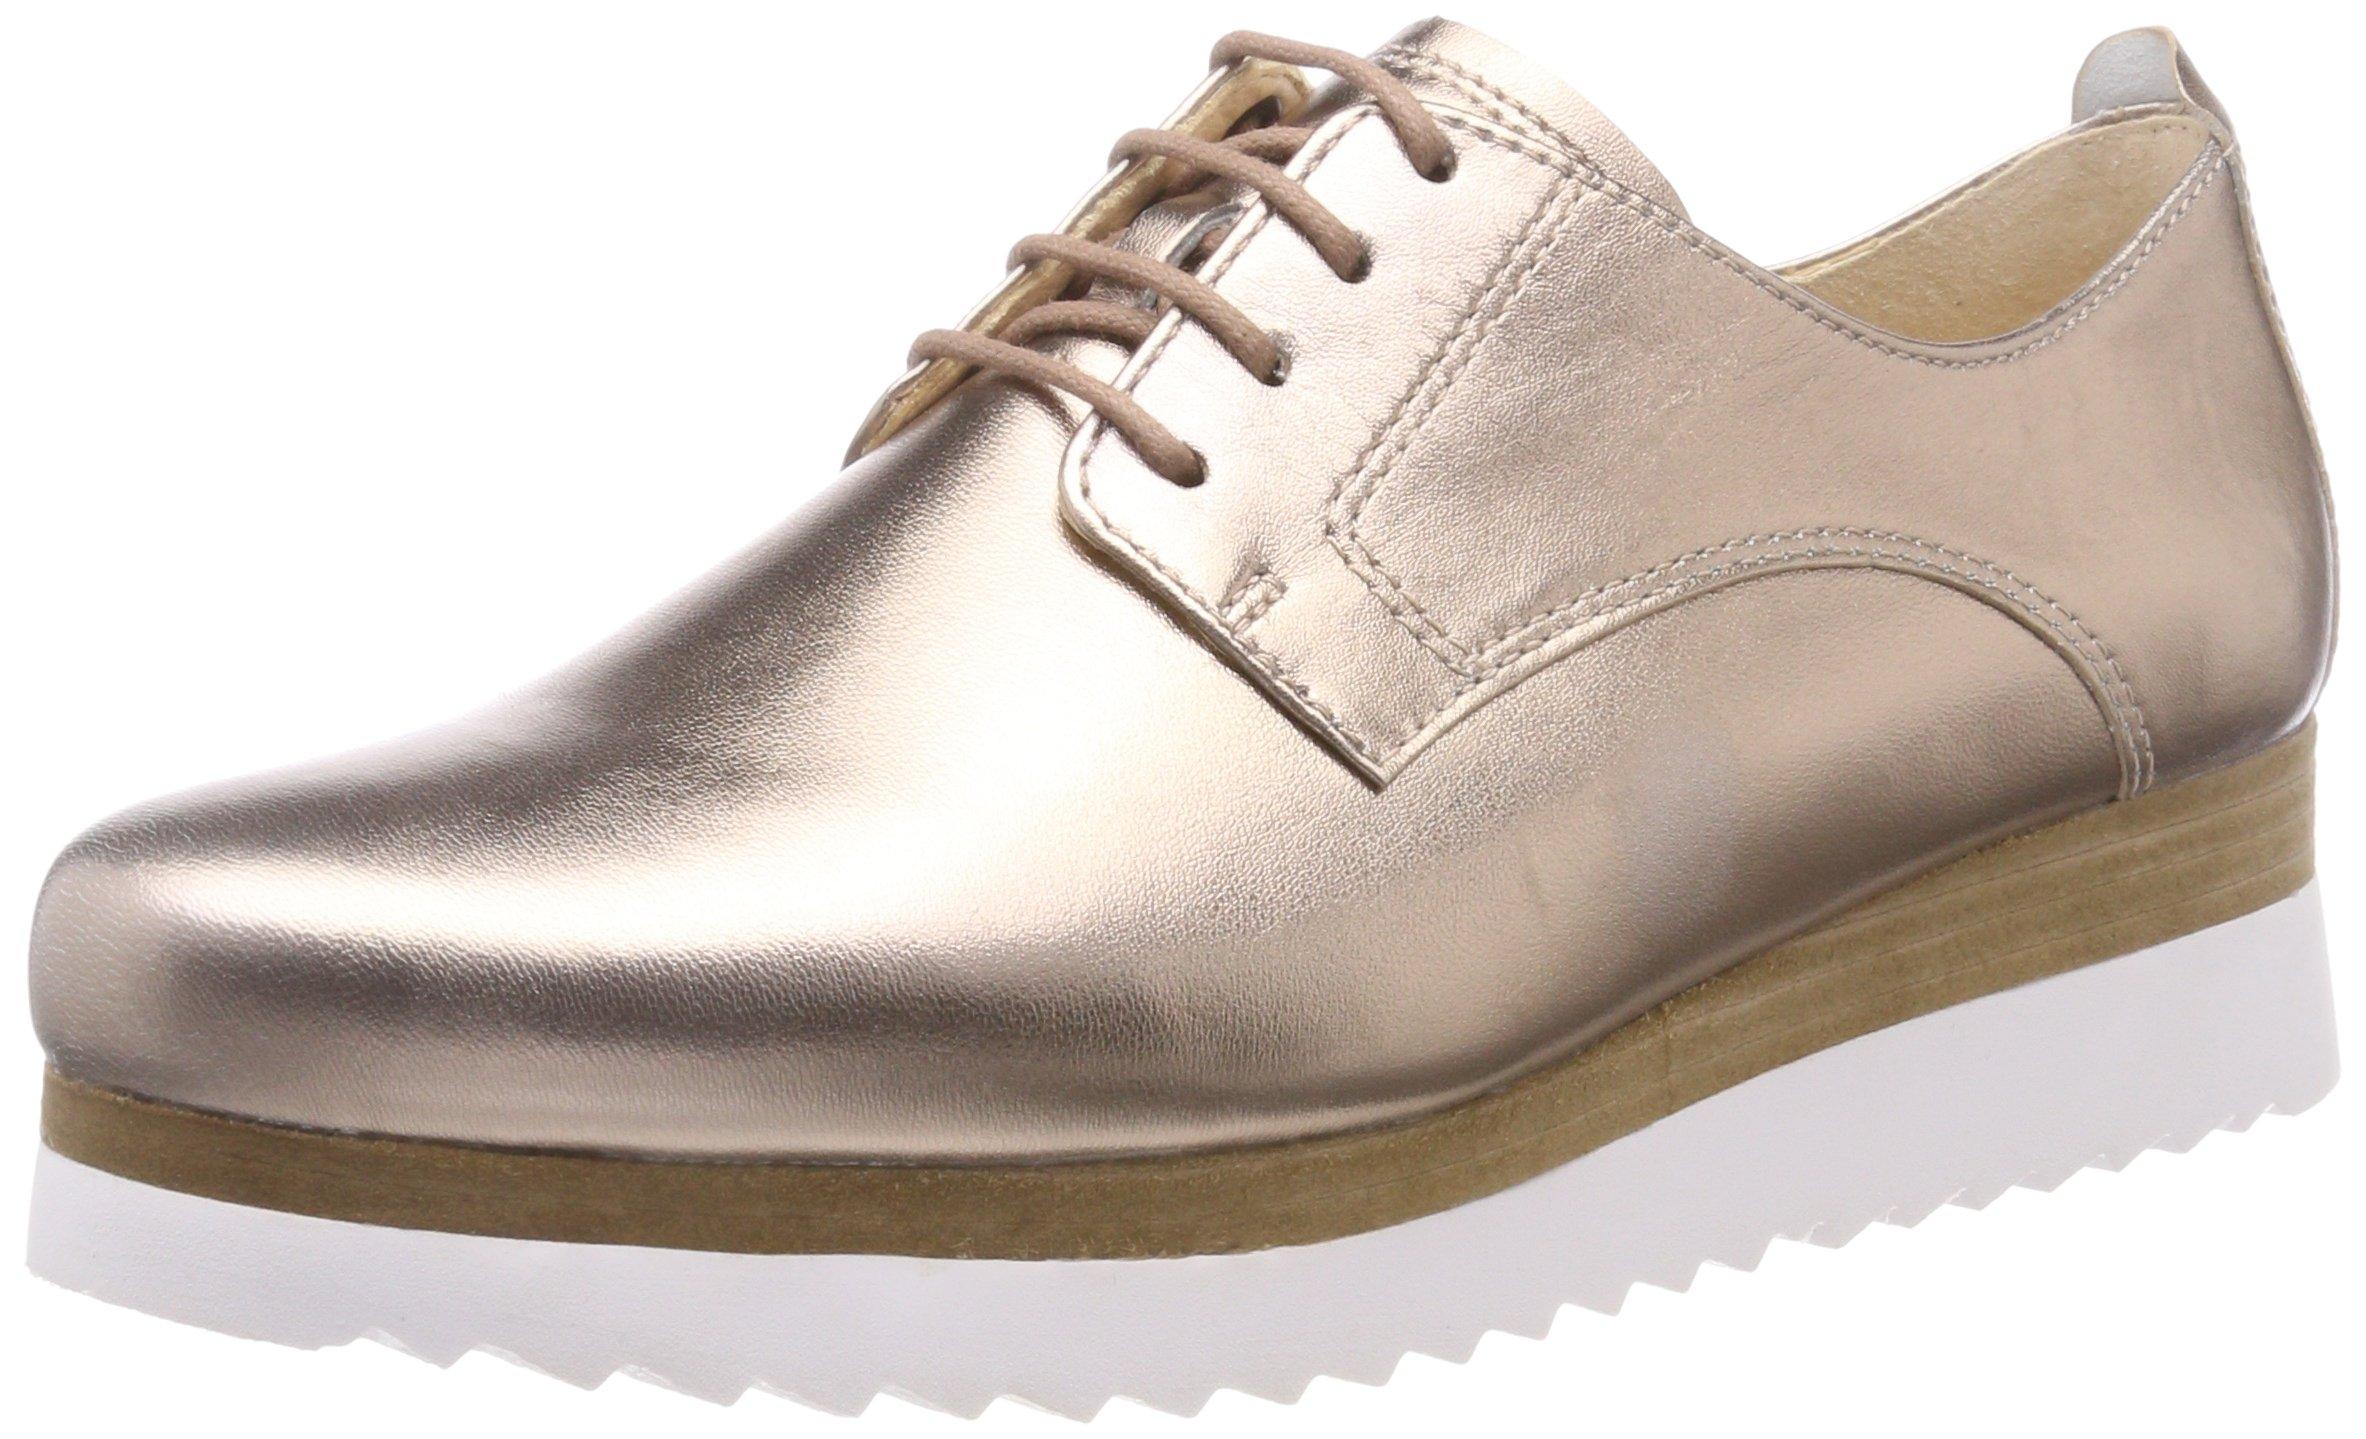 Shoes SportDerbys Gabor Eu FemmeMulticolorerame Comfort Schicht39 WD2IEH9Y